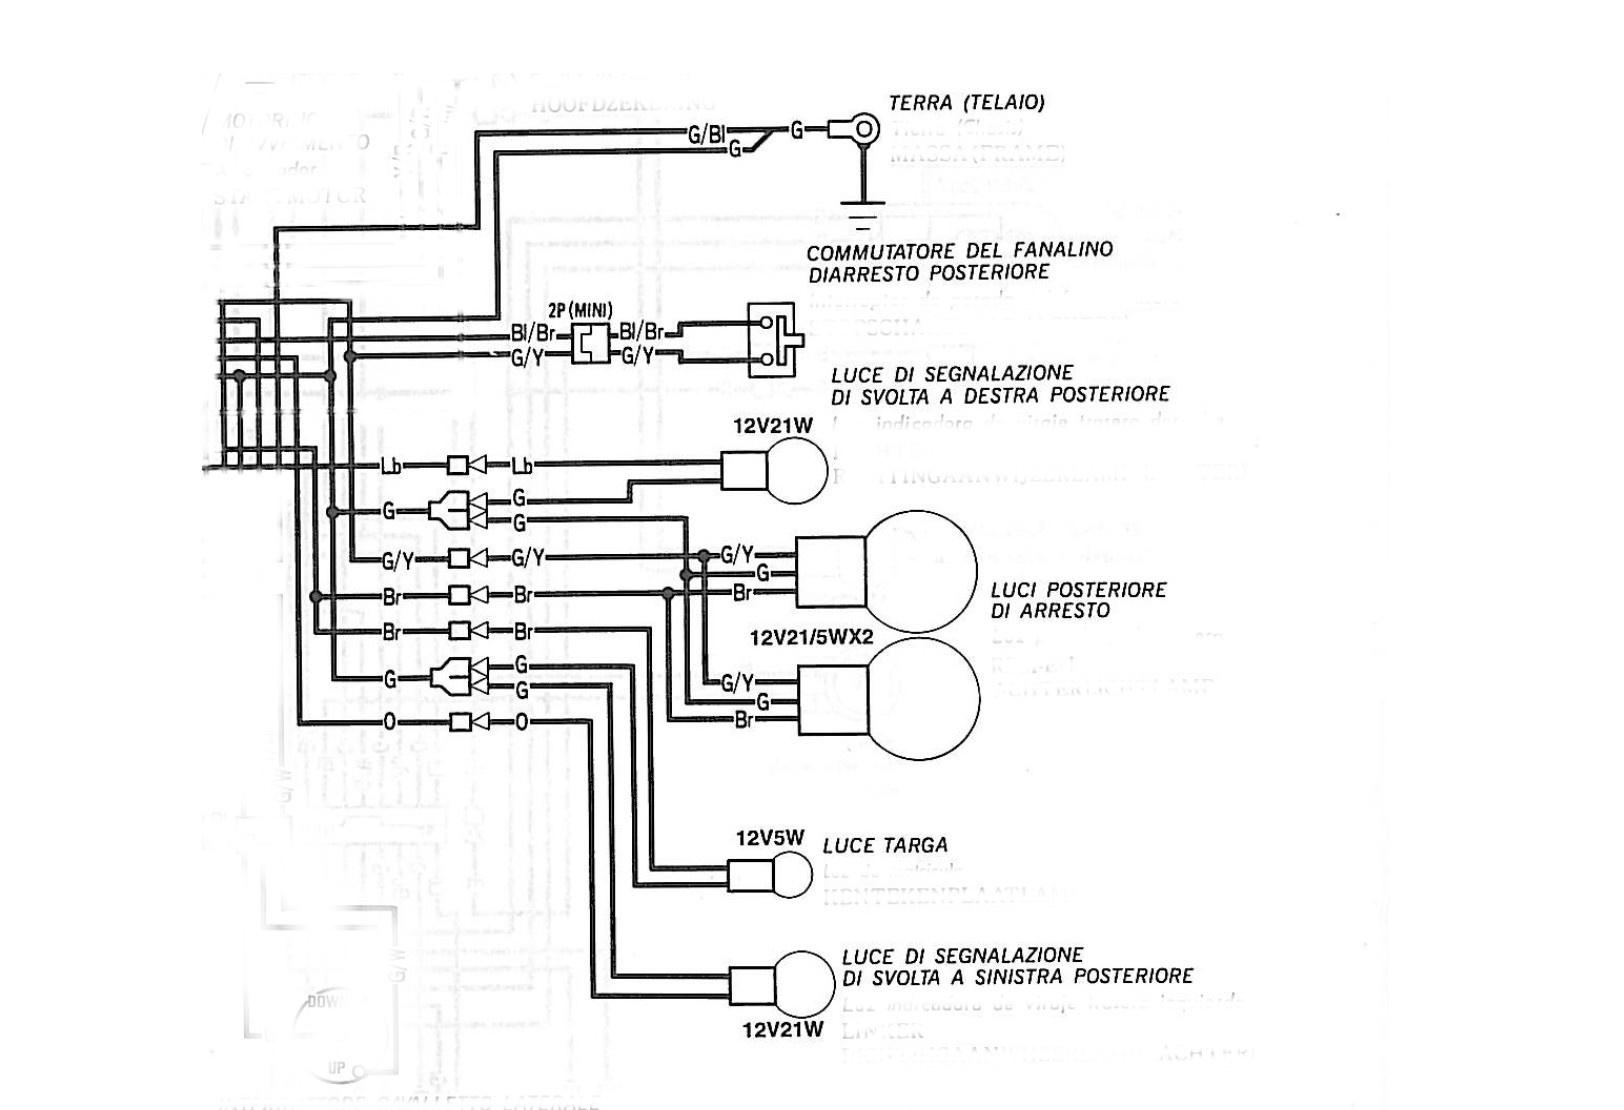 Schema Elettrico Honda Shadow 600 : Malfunzionamento luce targa shadow custommania